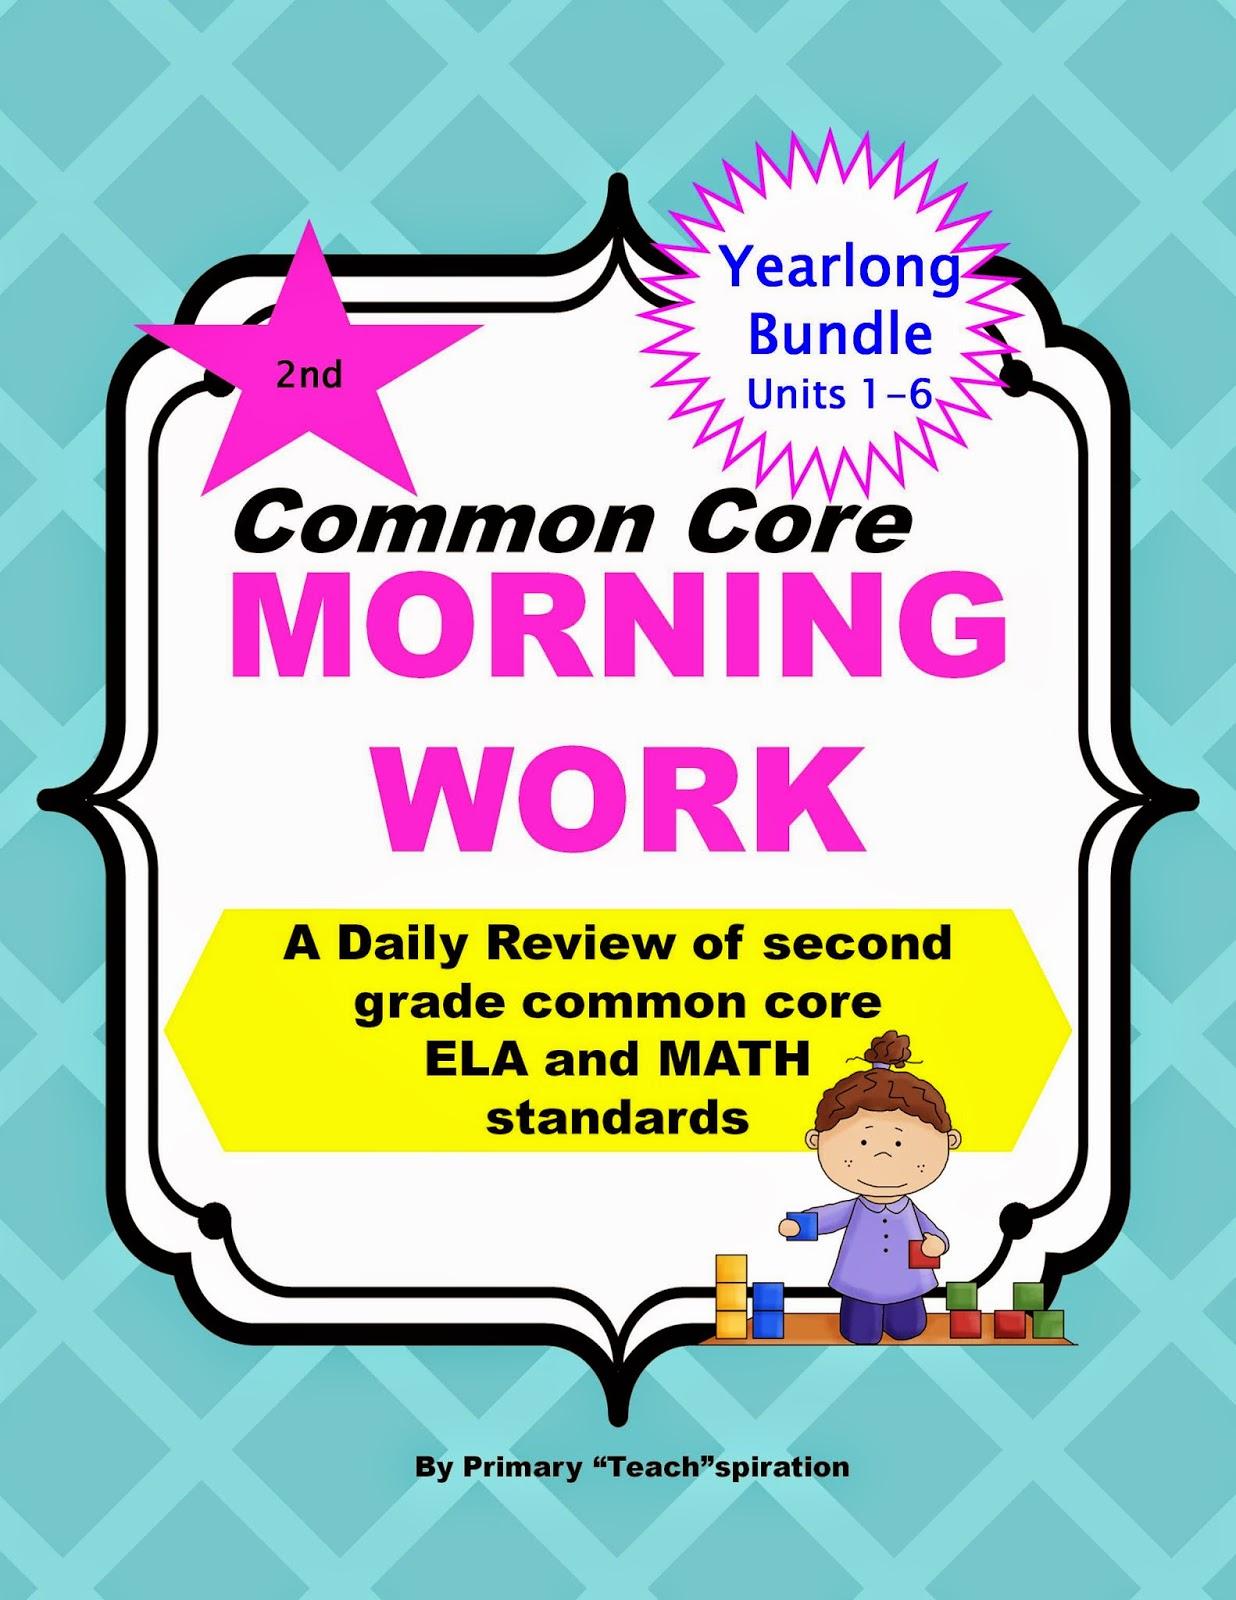 http://www.teacherspayteachers.com/Product/Morning-Work-2nd-Grade-Common-Core-BUNDLE-A-Daily-ELA-Math-Review-843388